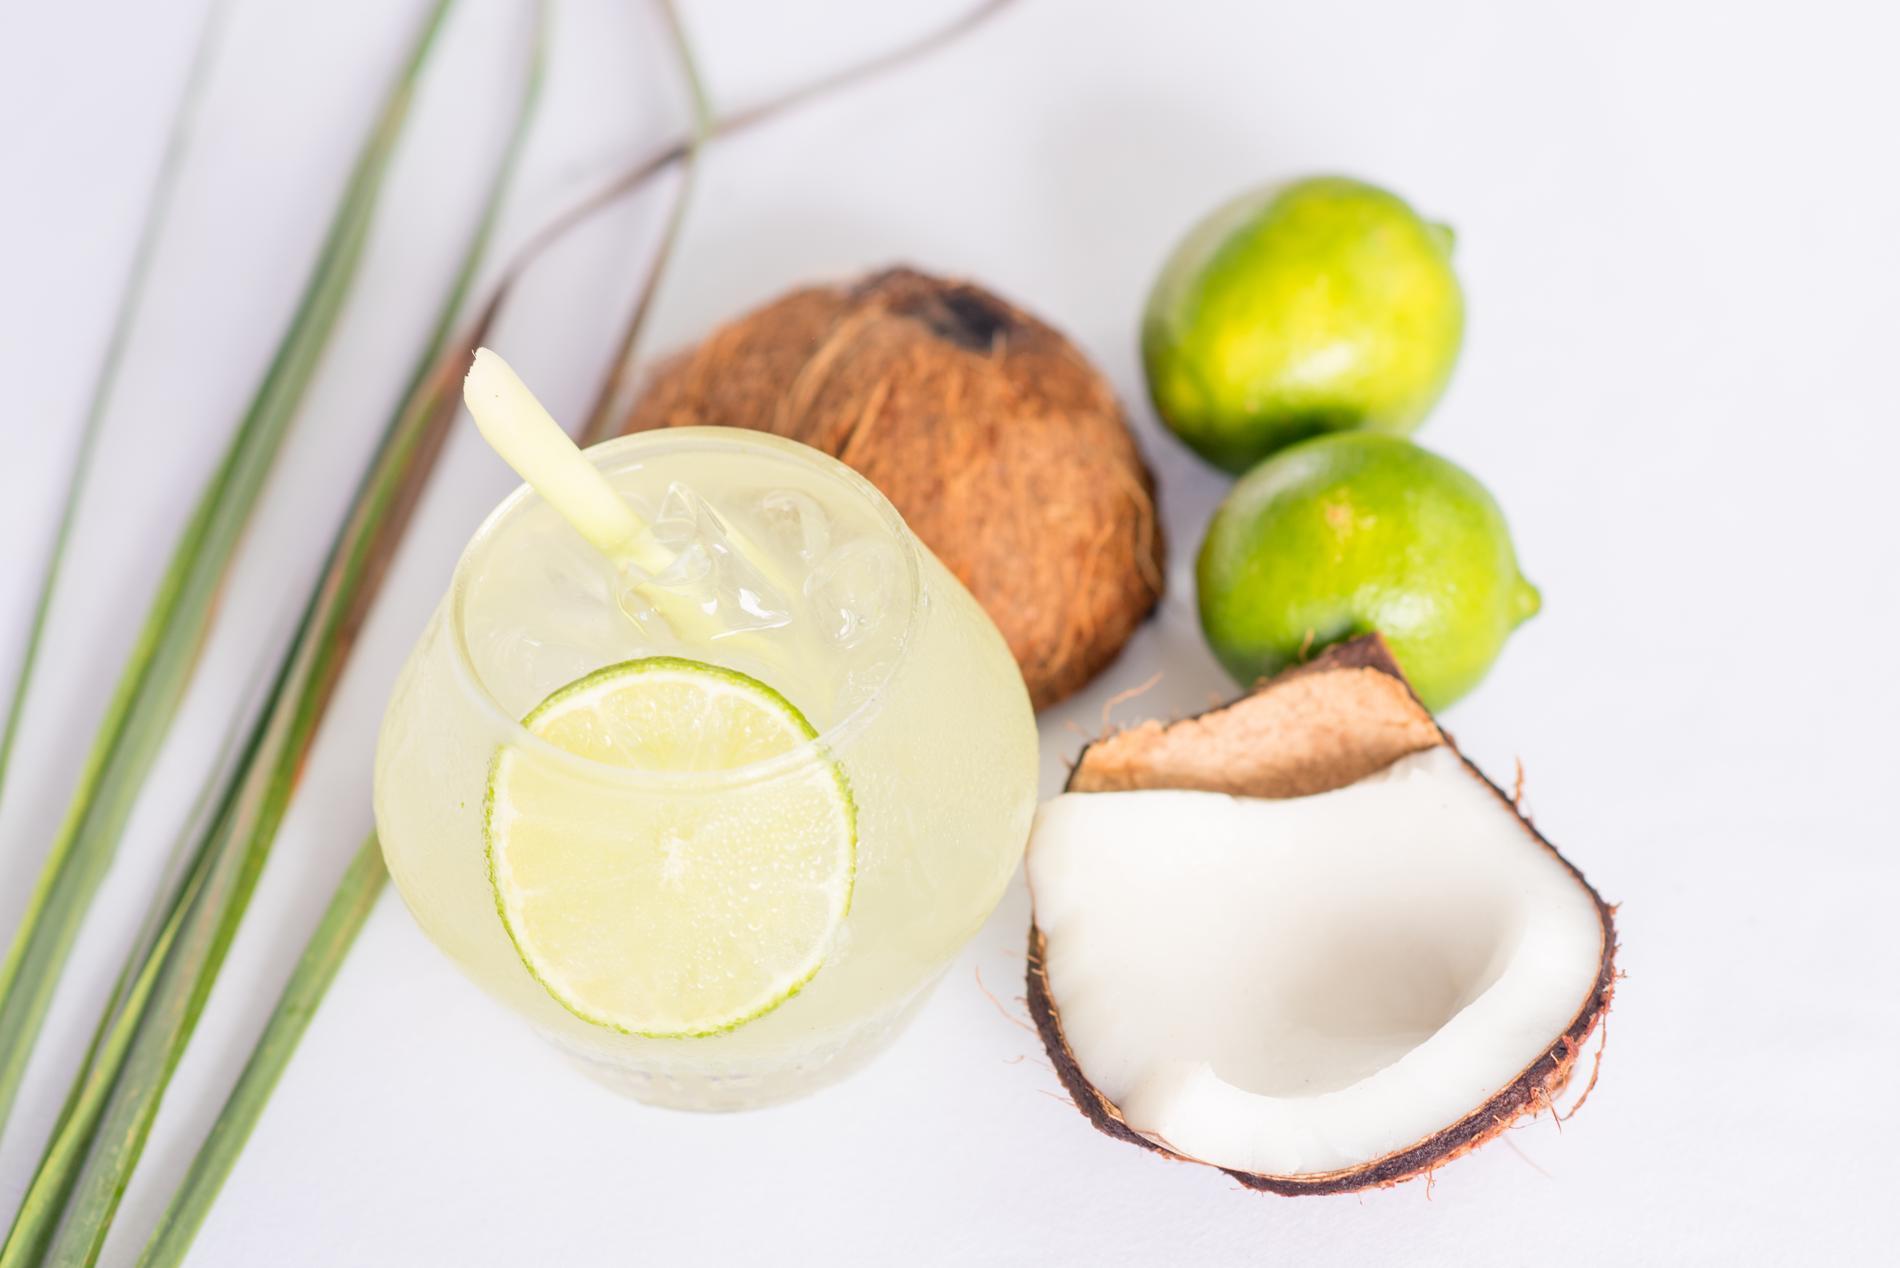 recette cocktail rhum coco gingembre citronnelle et coriandre cuisine madame figaro. Black Bedroom Furniture Sets. Home Design Ideas